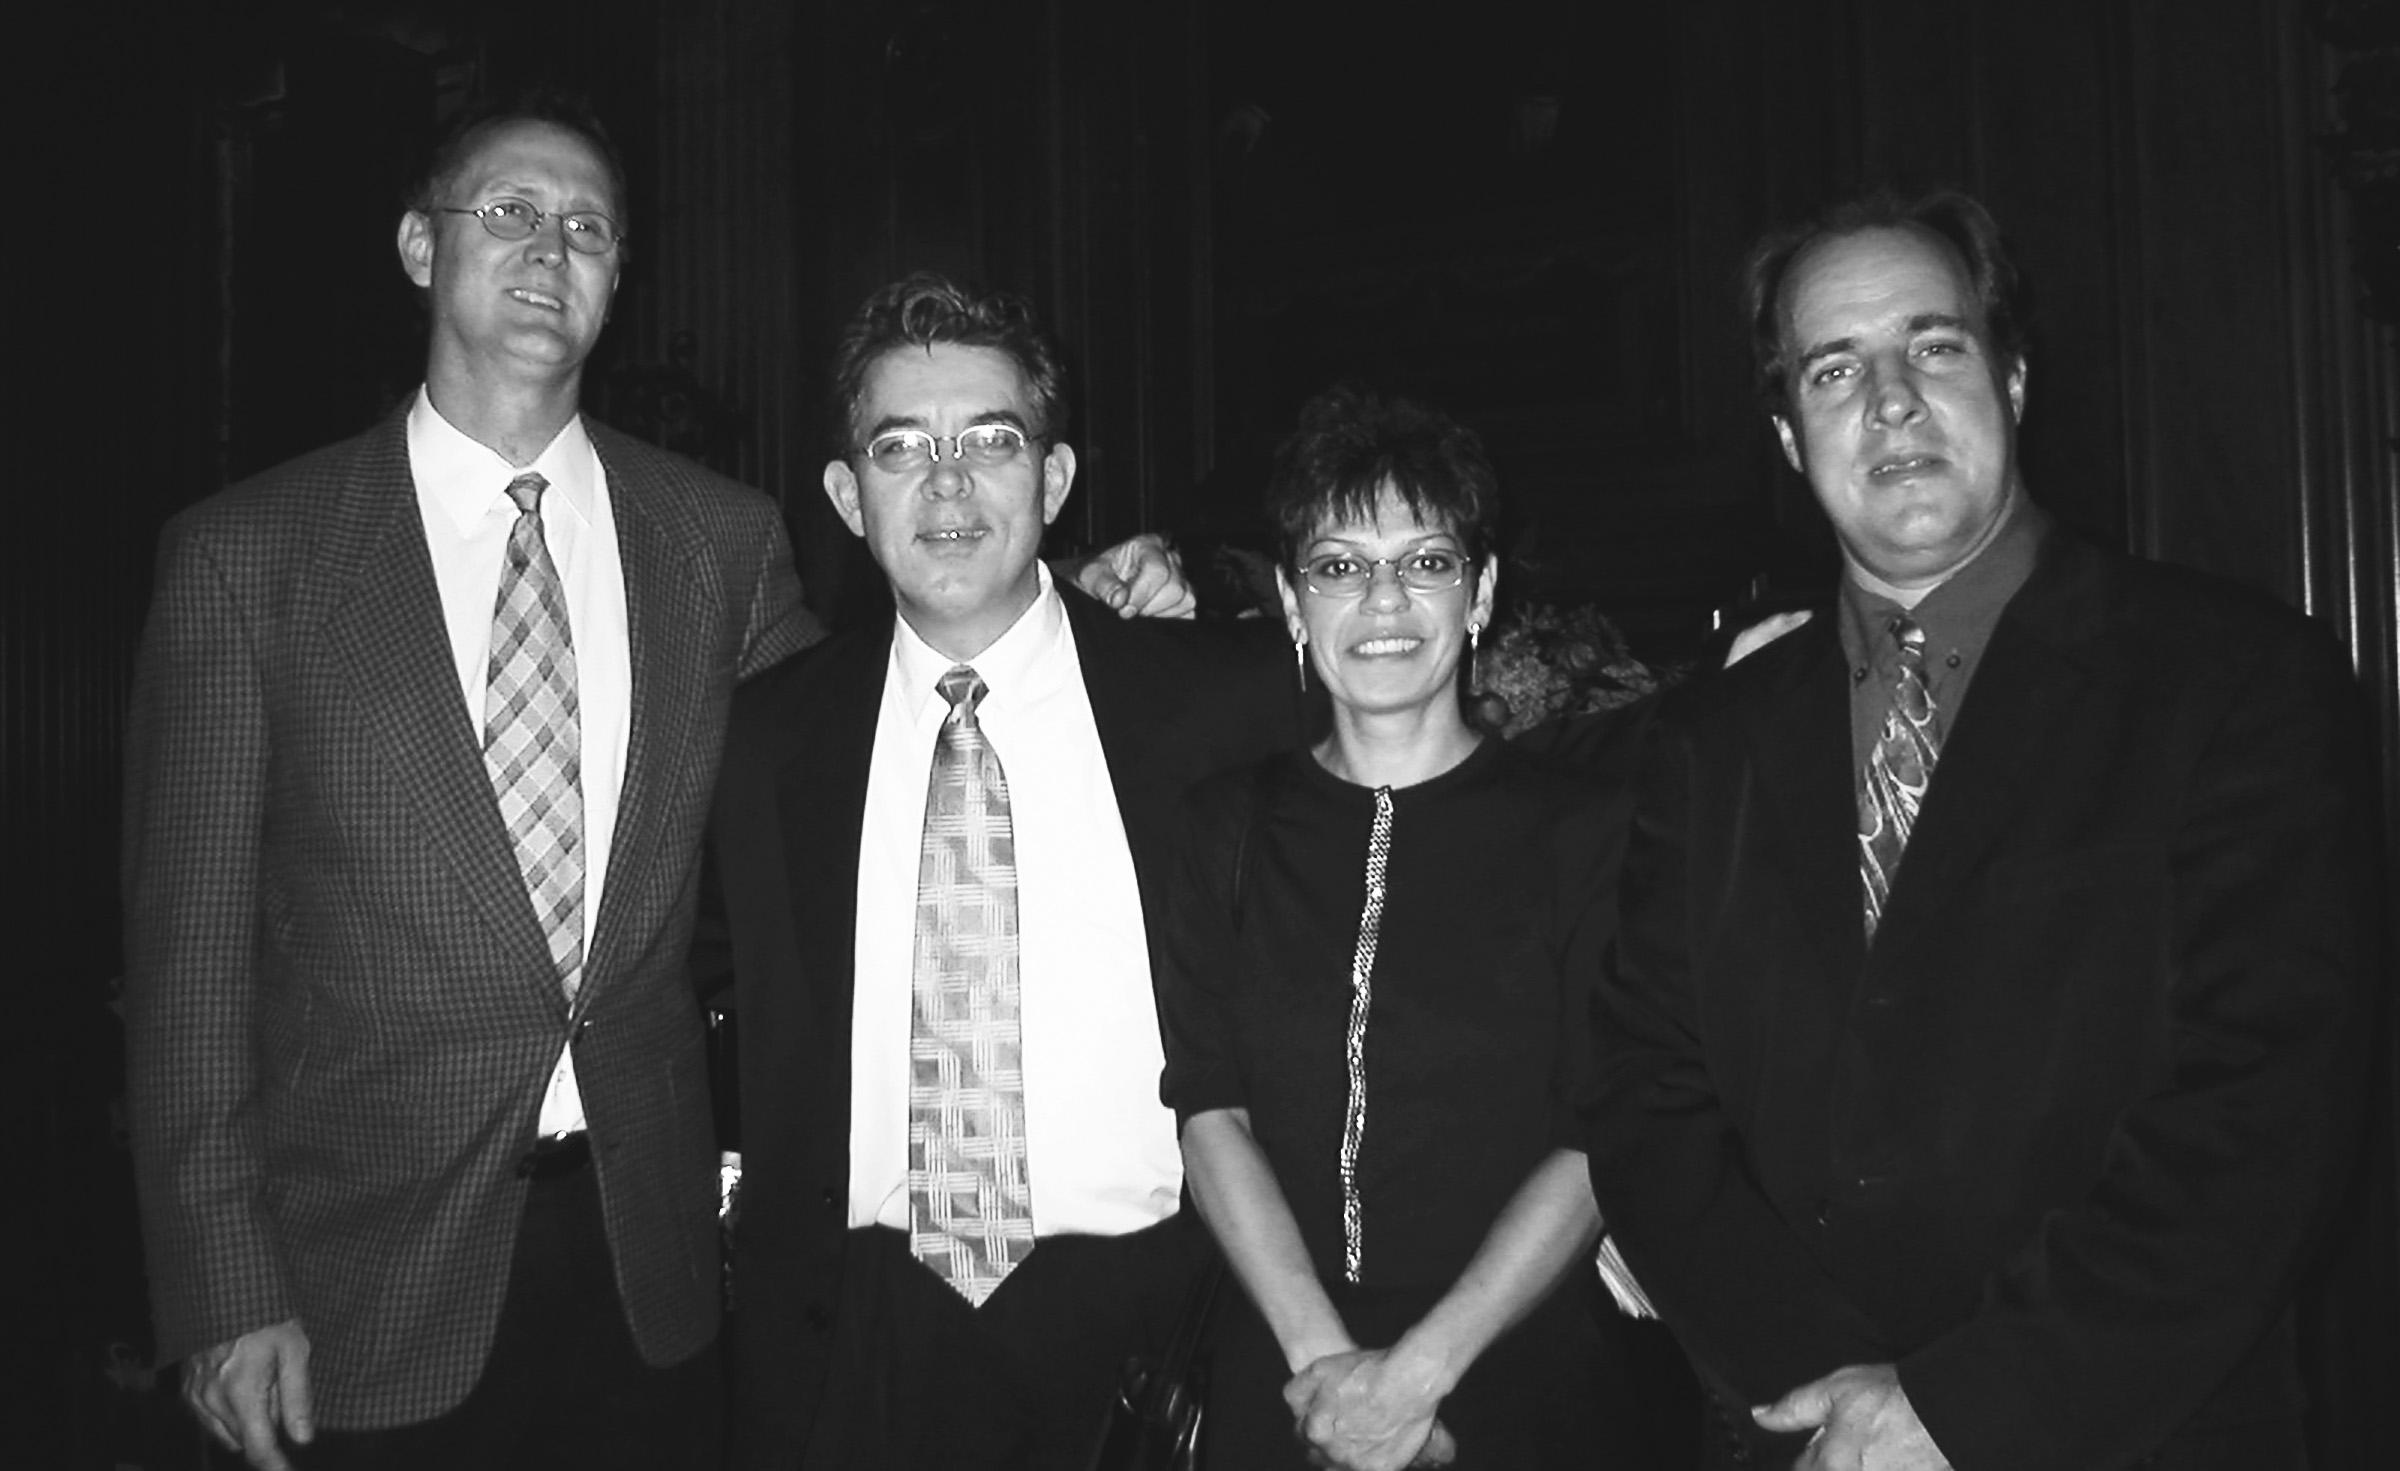 Datevik with hertrio,Bob Albanese,Joe Fitzgerald, andDavid Meade.